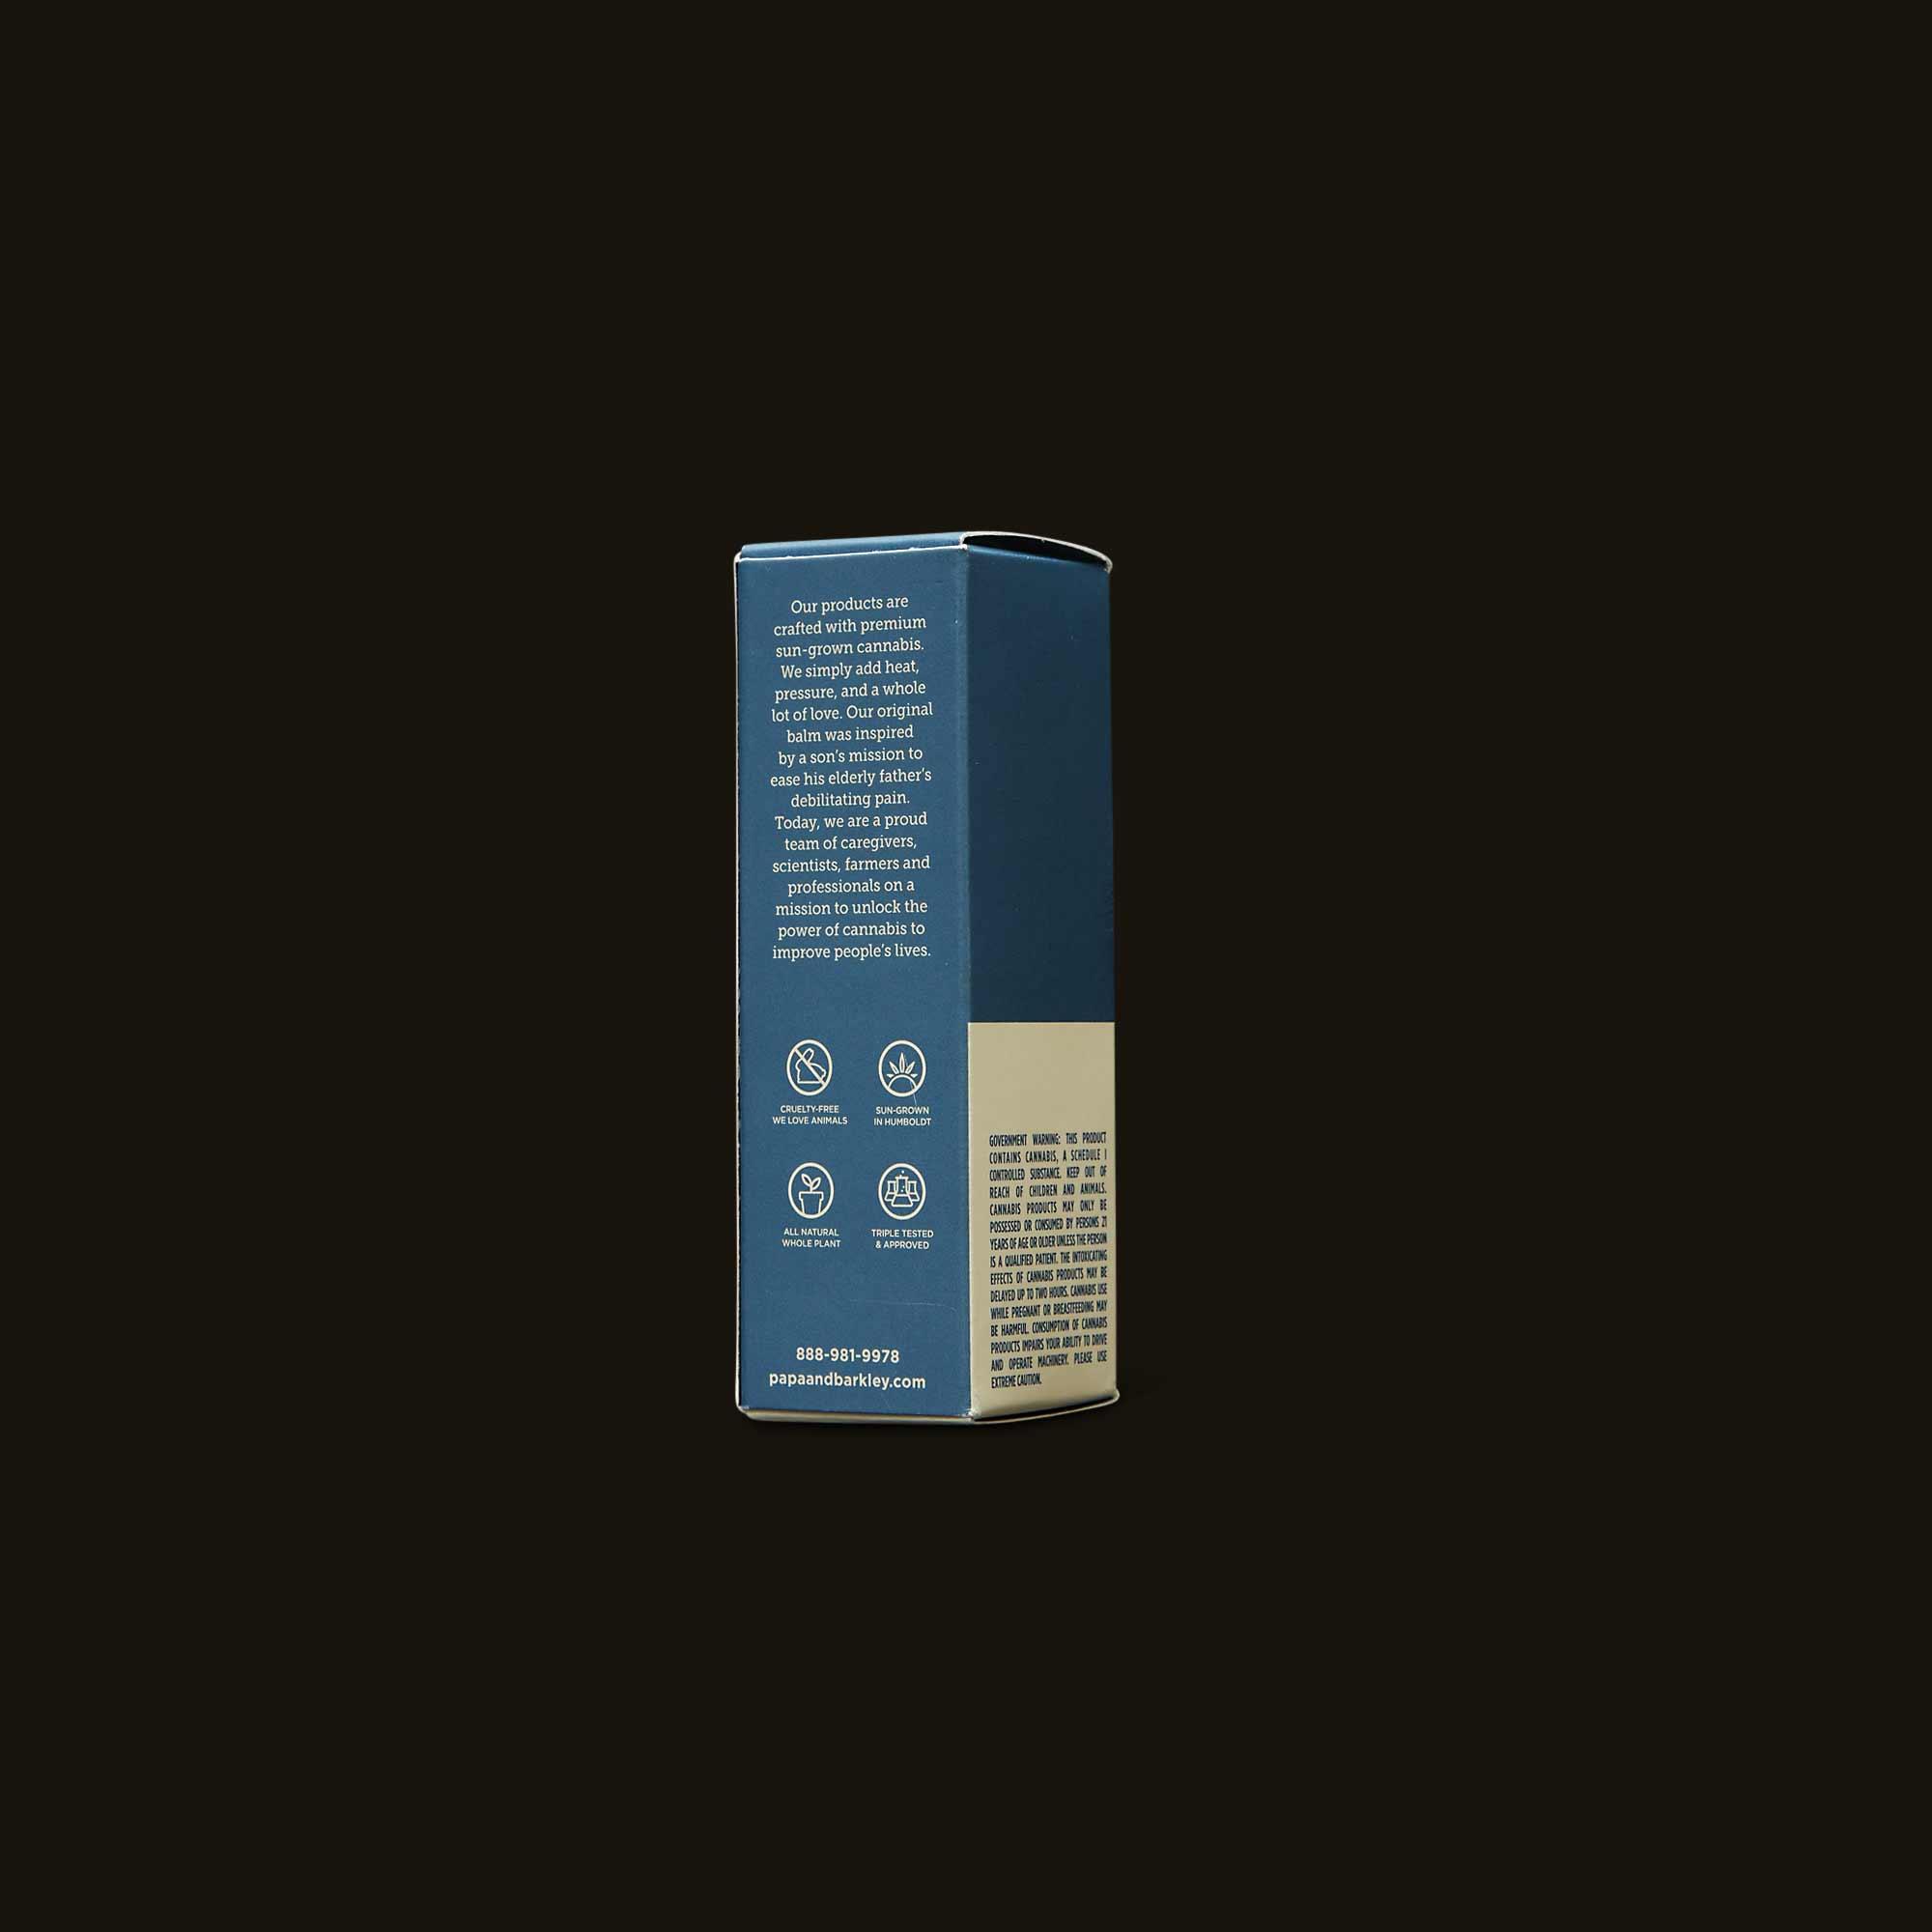 Papa & Barkley 1:3 CBD:THC Releaf Tincture